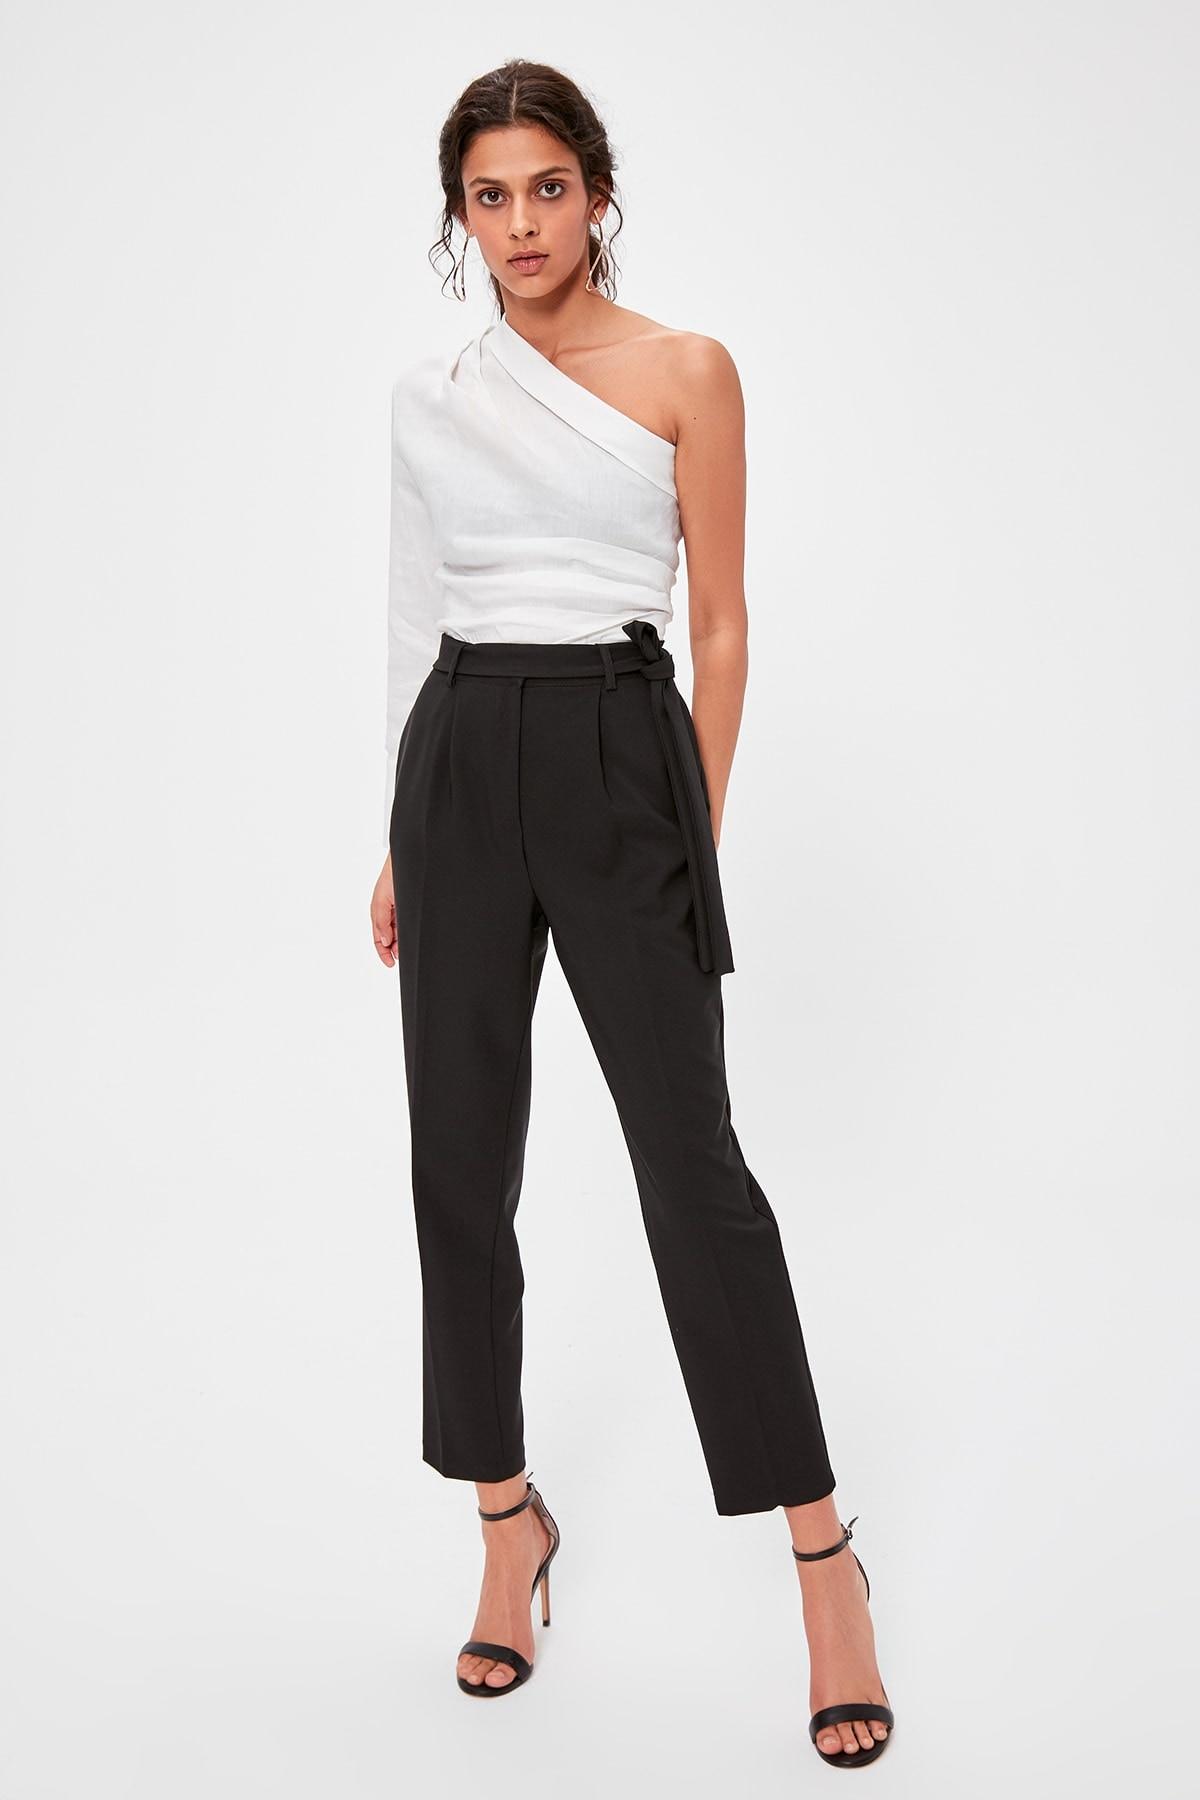 Trendyol Black Carrot Pants TWOAW20PL0245